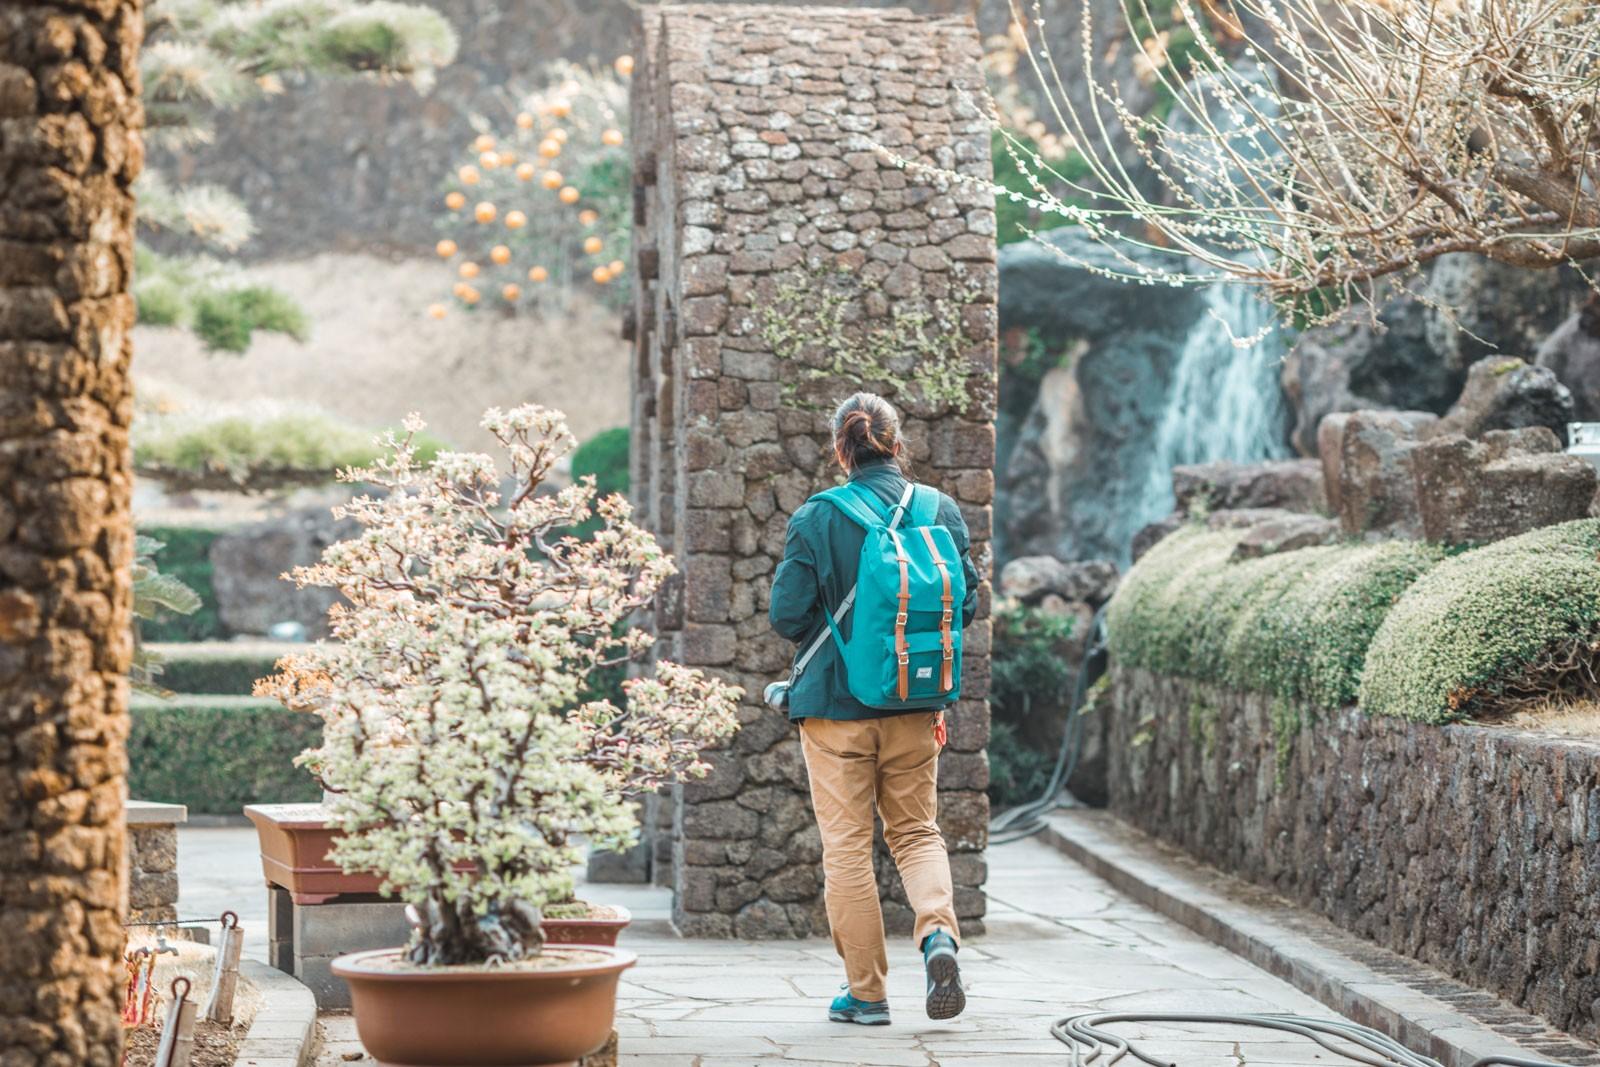 ninaah bulles, corée du sud, korea, spirited garden, voyage, jeju